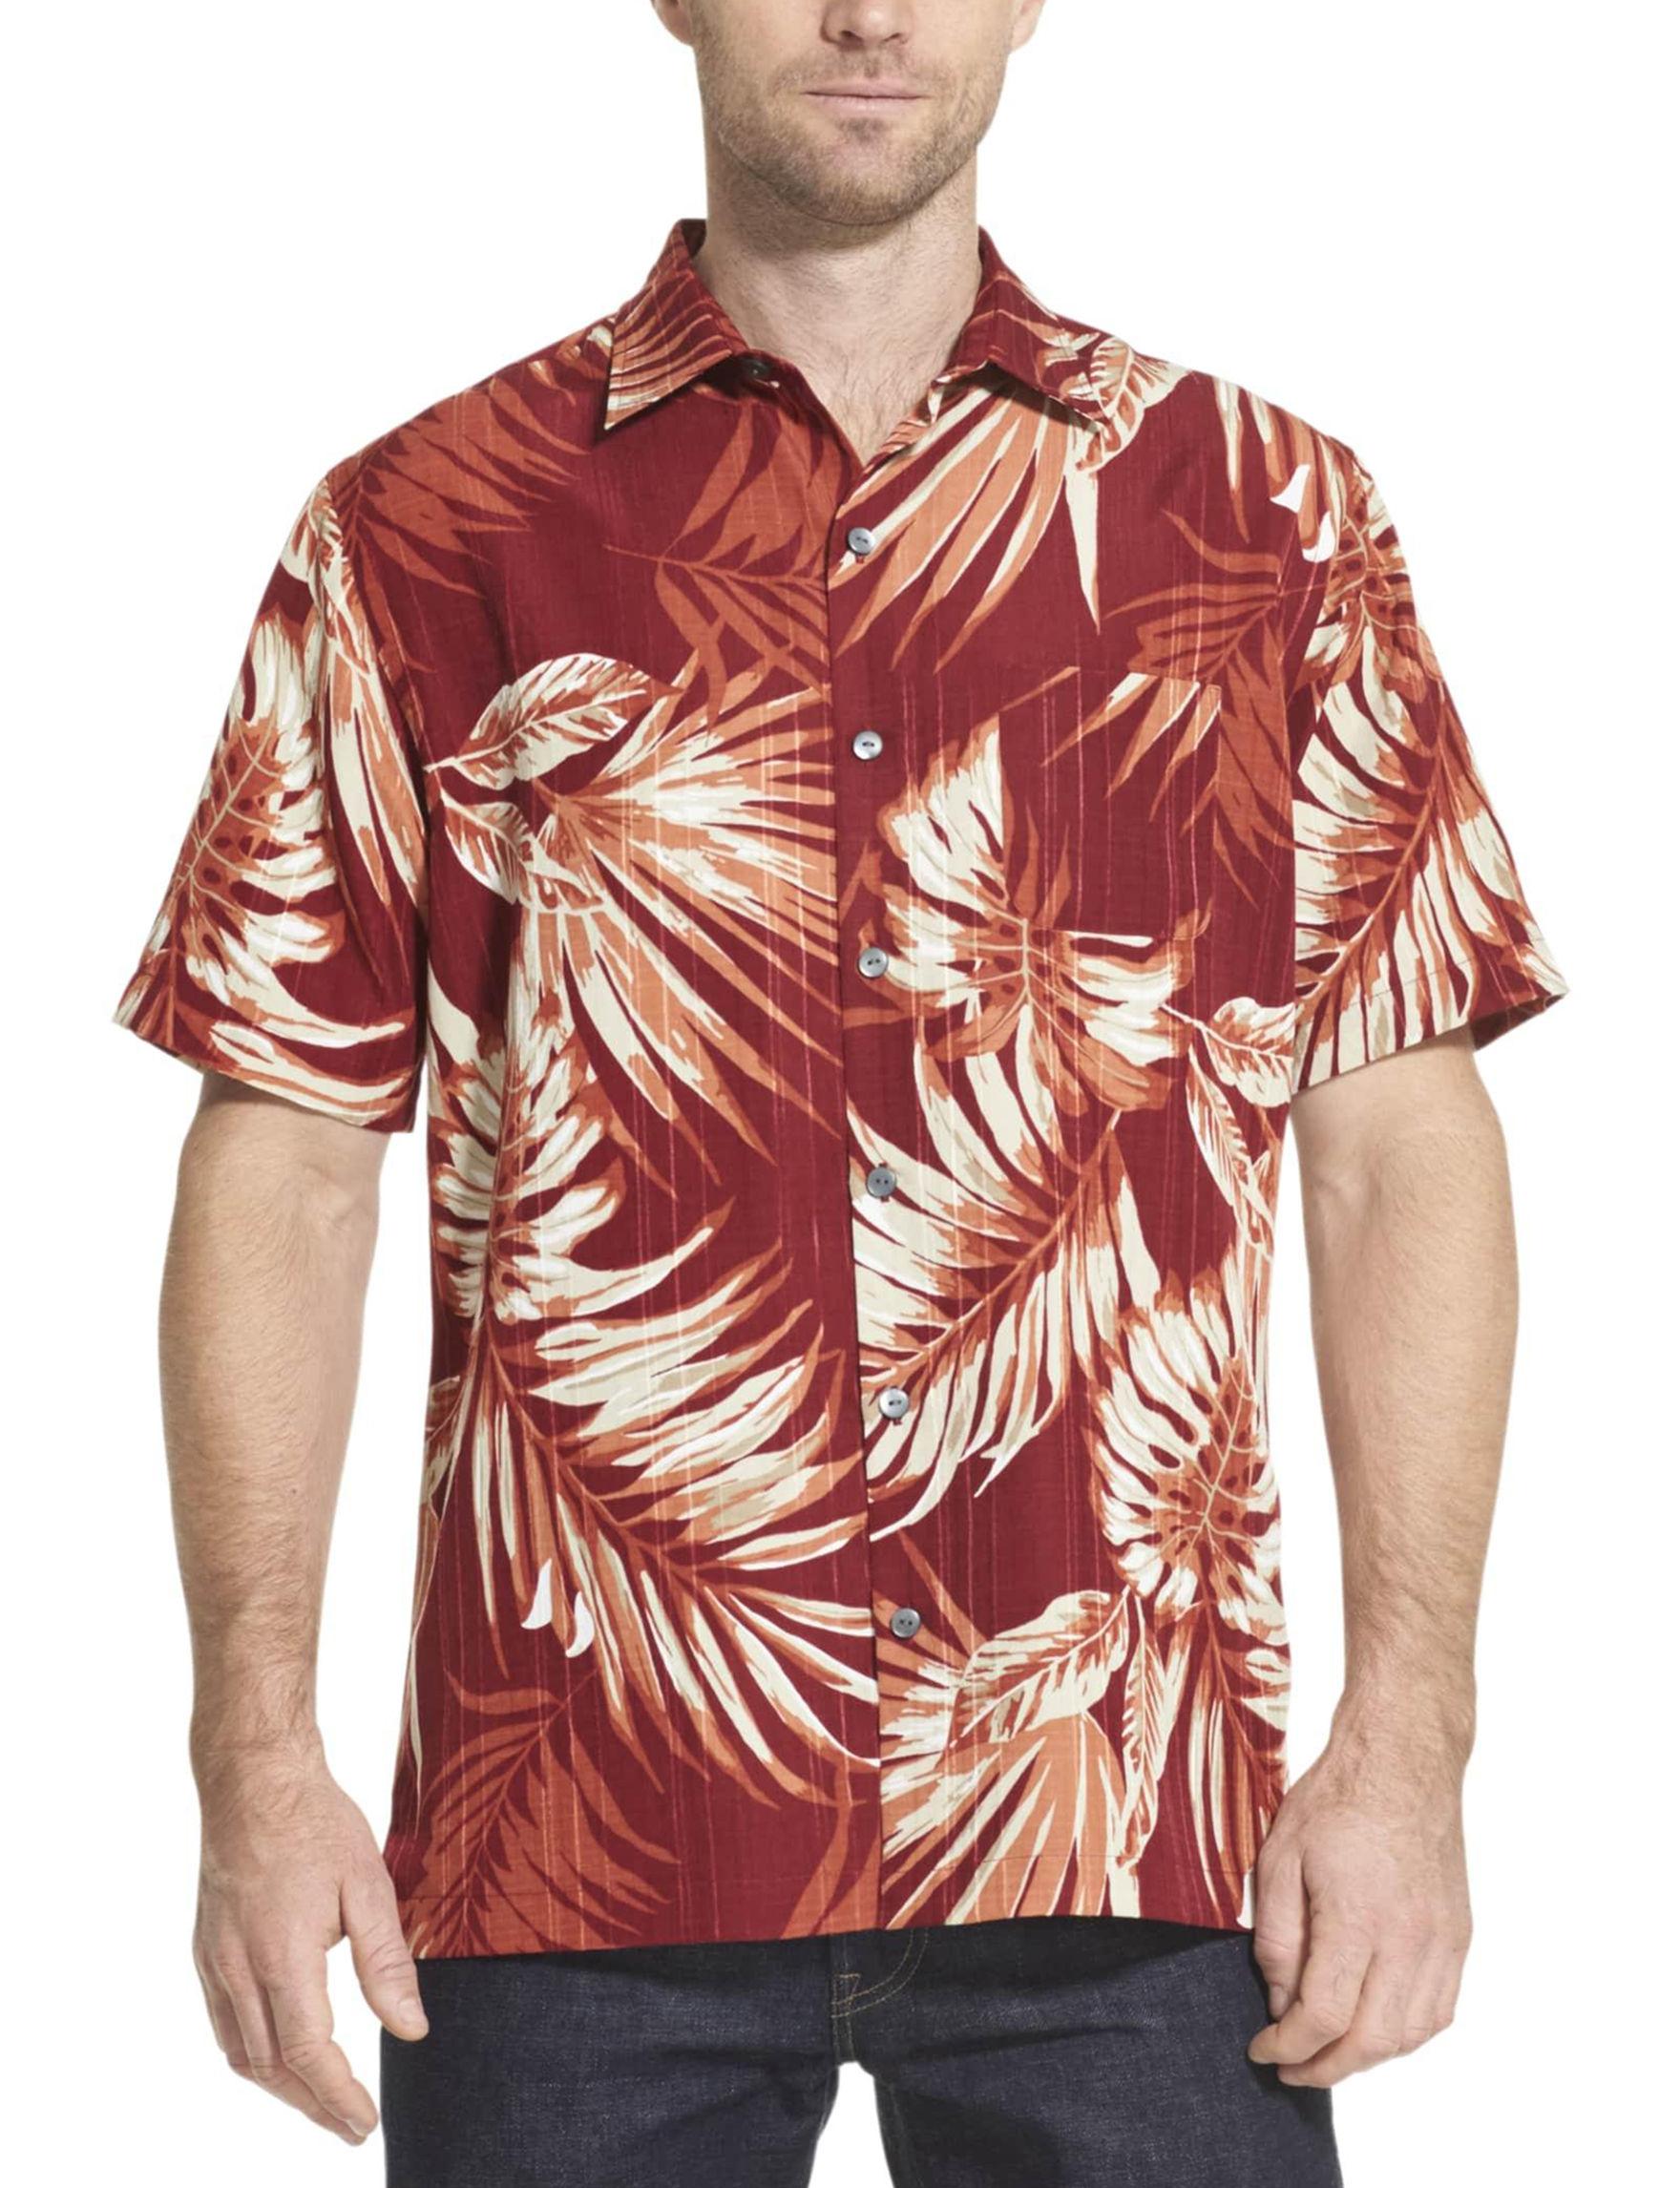 Van Heusen Red Casual Button Down Shirts